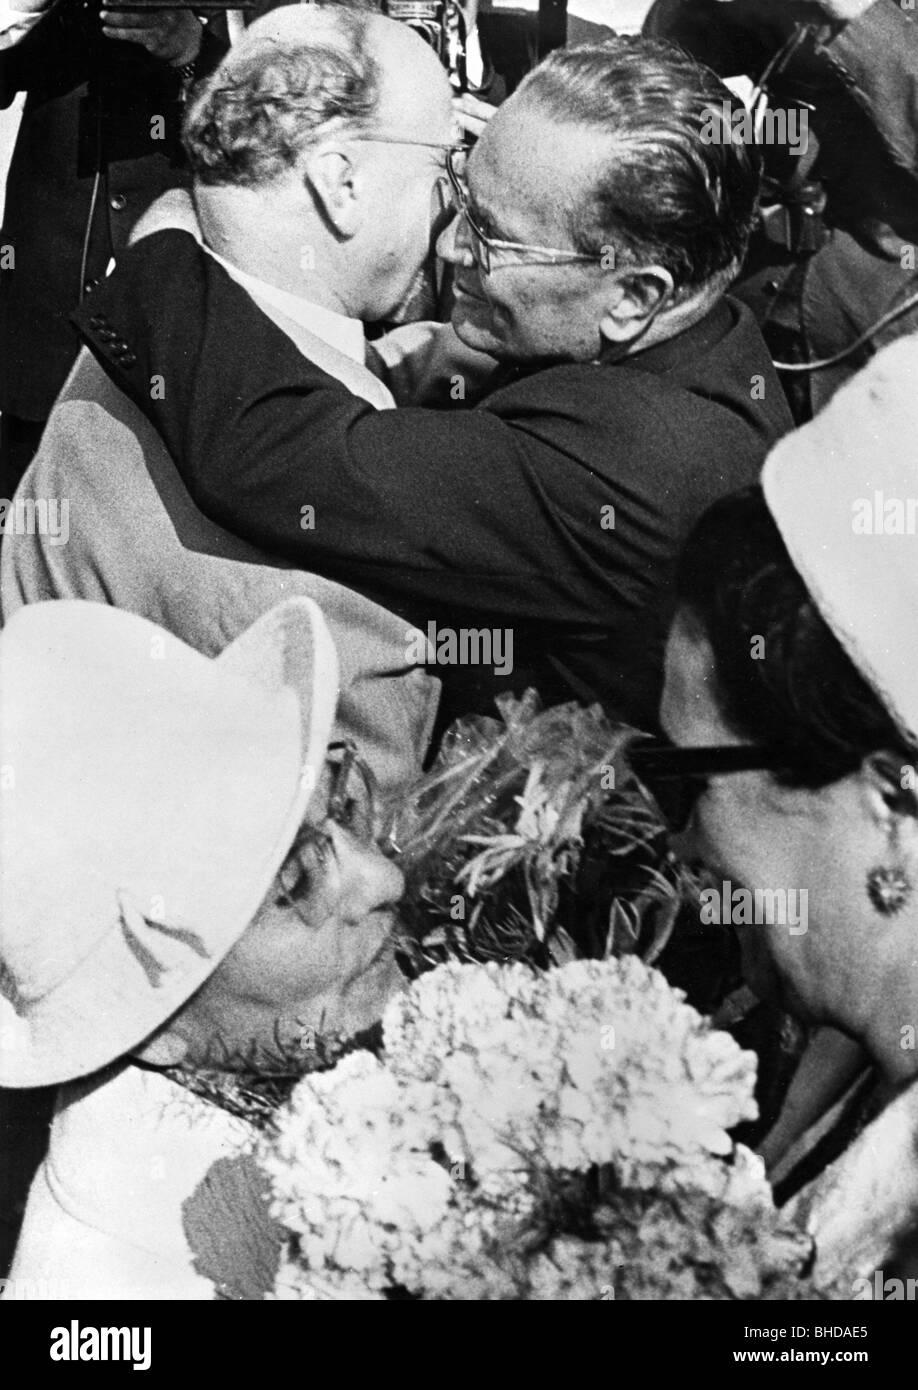 Tito (Josip Broz), 25.2.1892 - 4.5.1980, Yugoslavian politician, President 14.1.1953 - 4.5.1980, state visit to Stock Photo